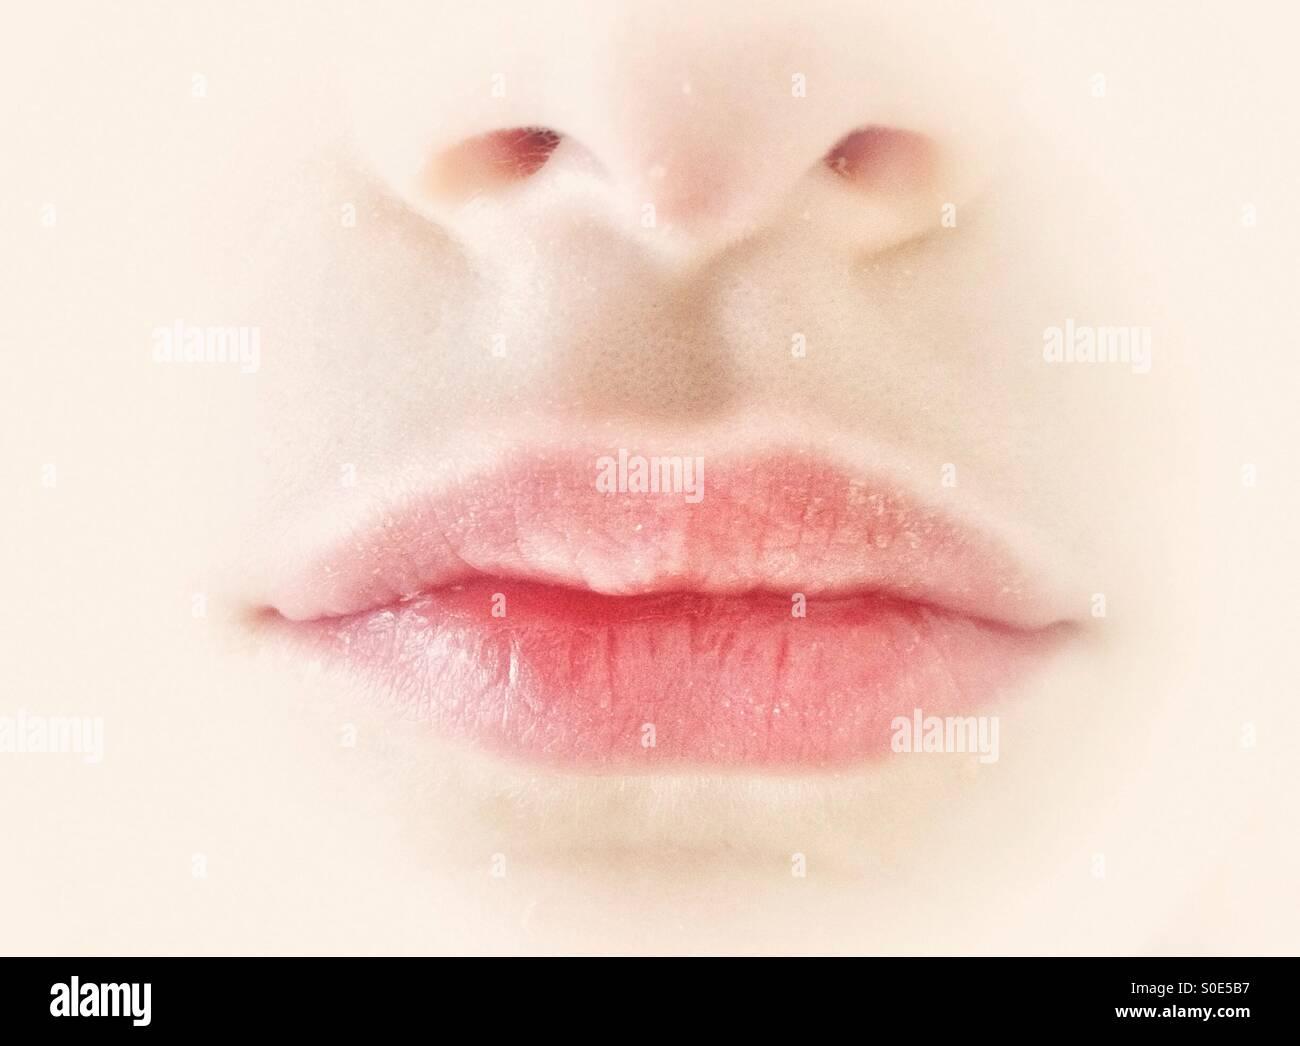 Lips of young girl - Stock Image